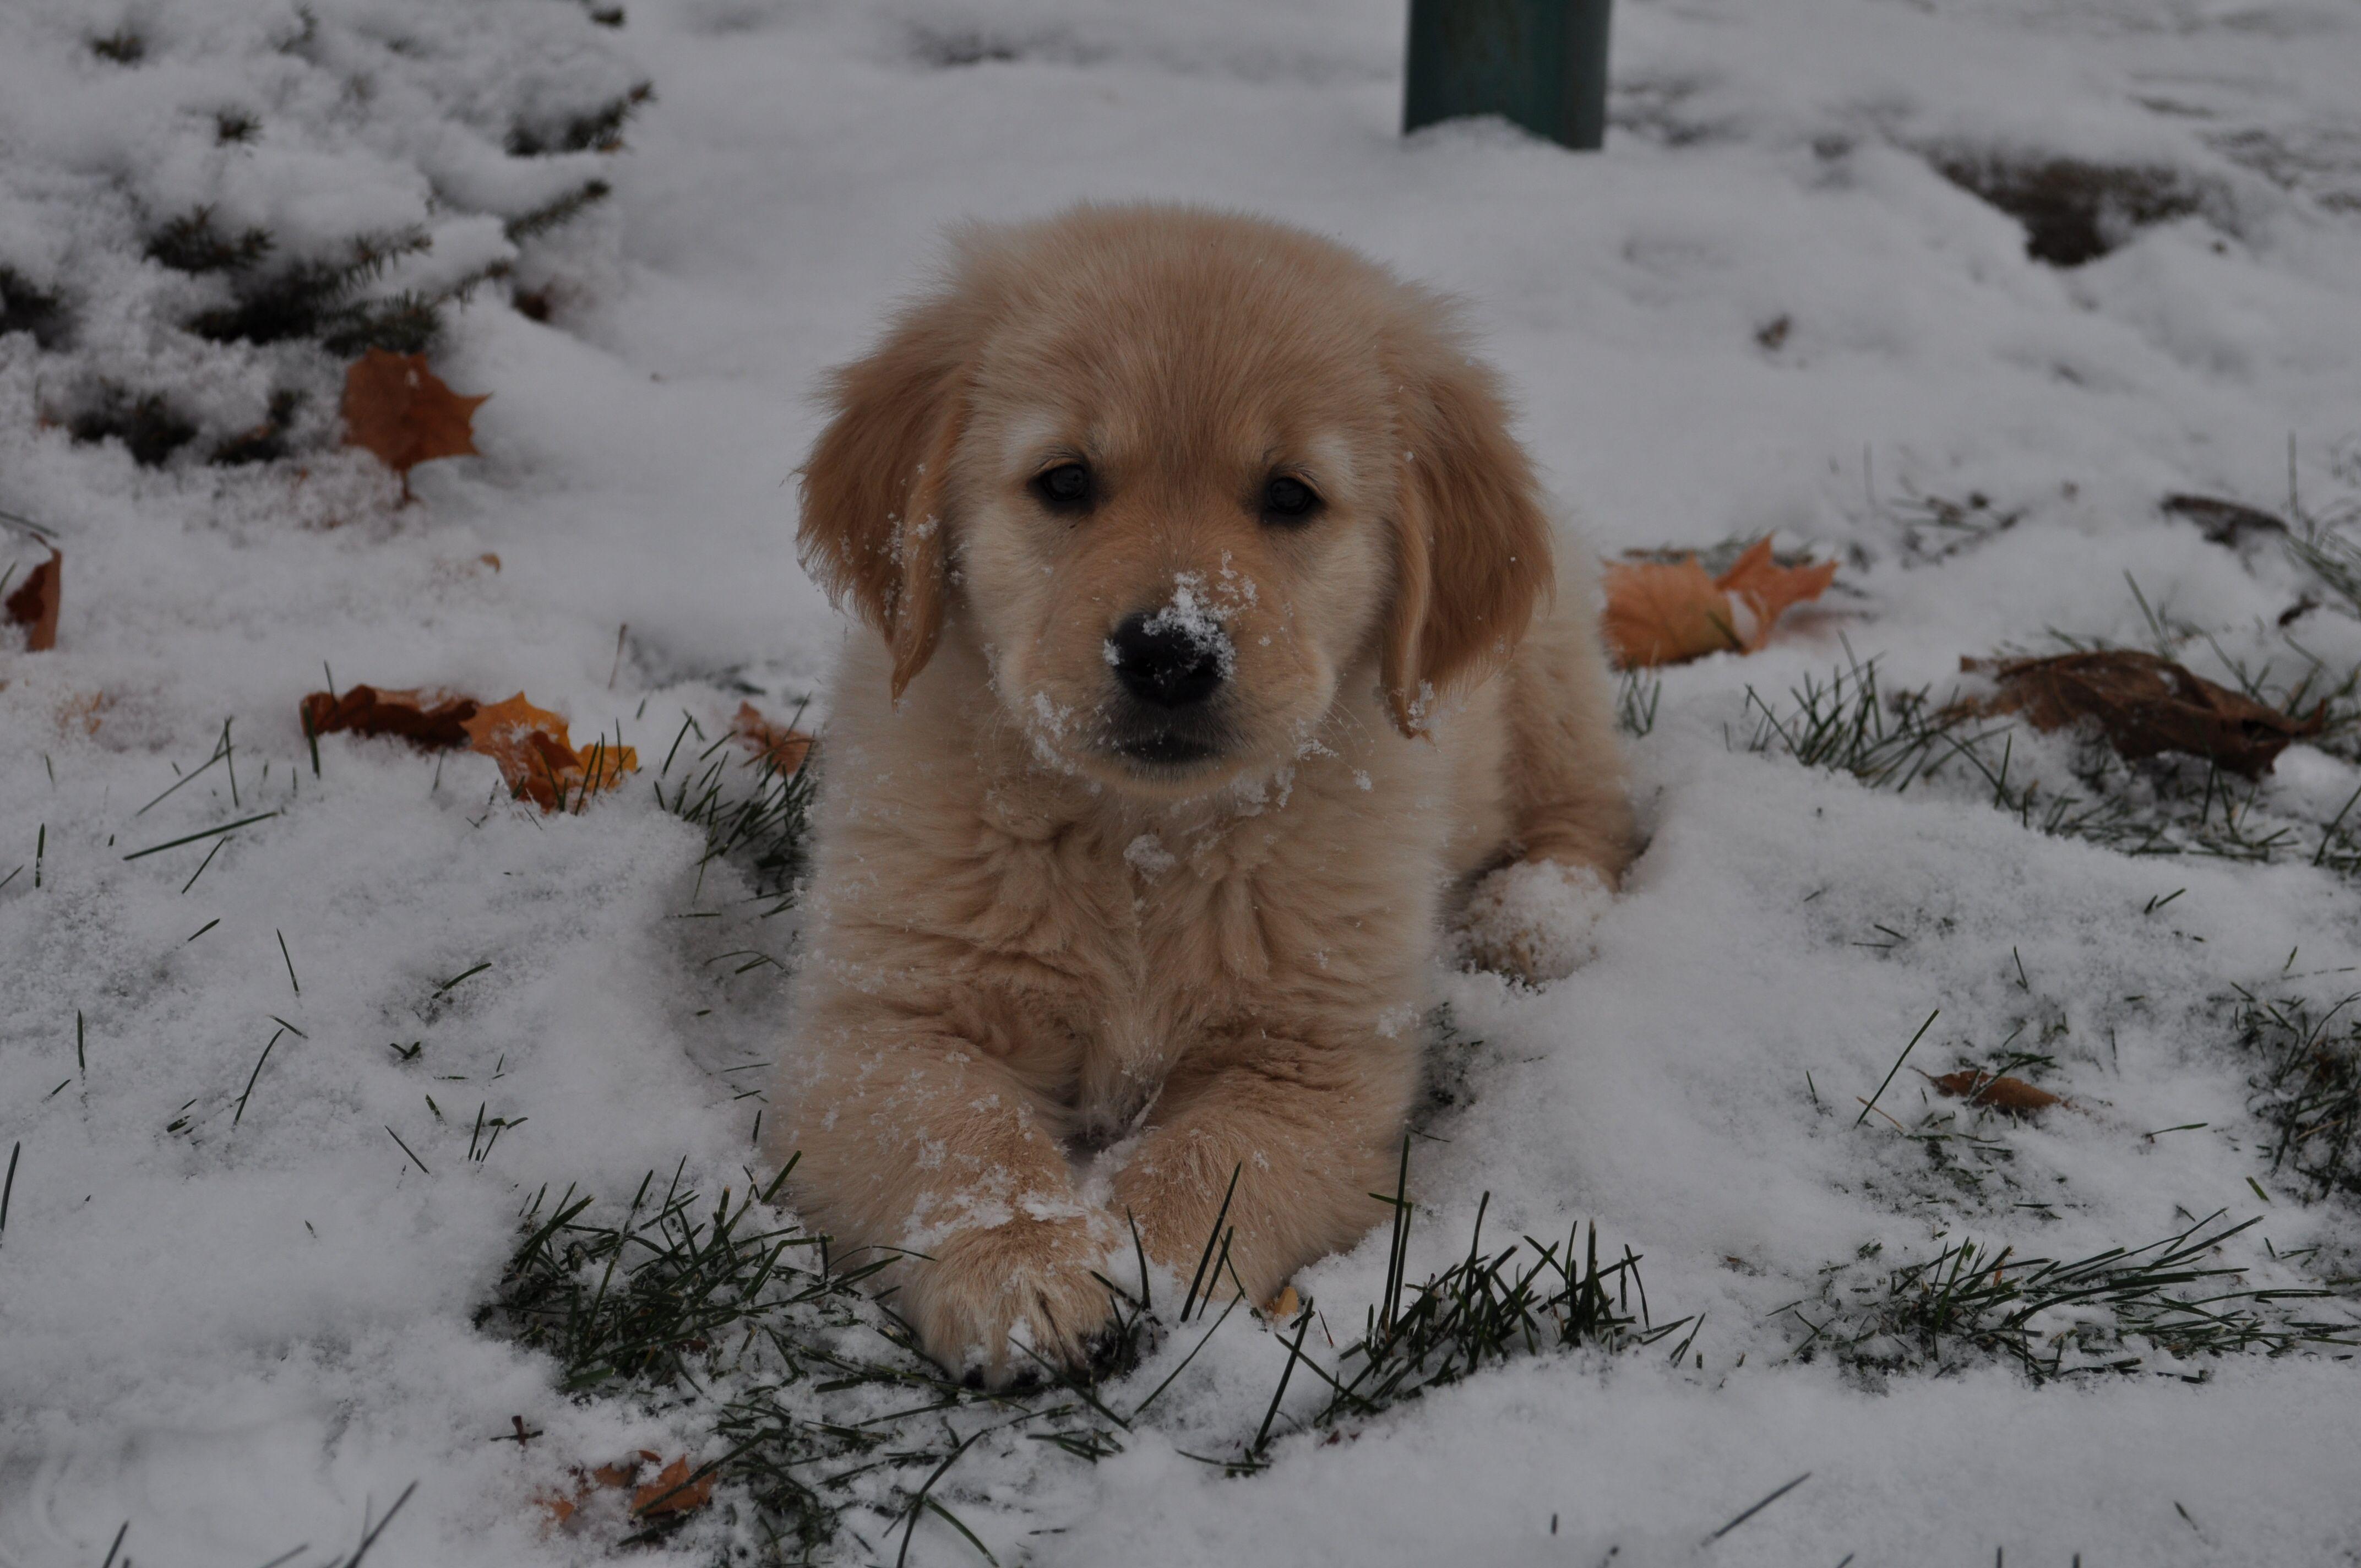 Goldenretriever Puppy Cute Dog Love Winter Snow Cutedog